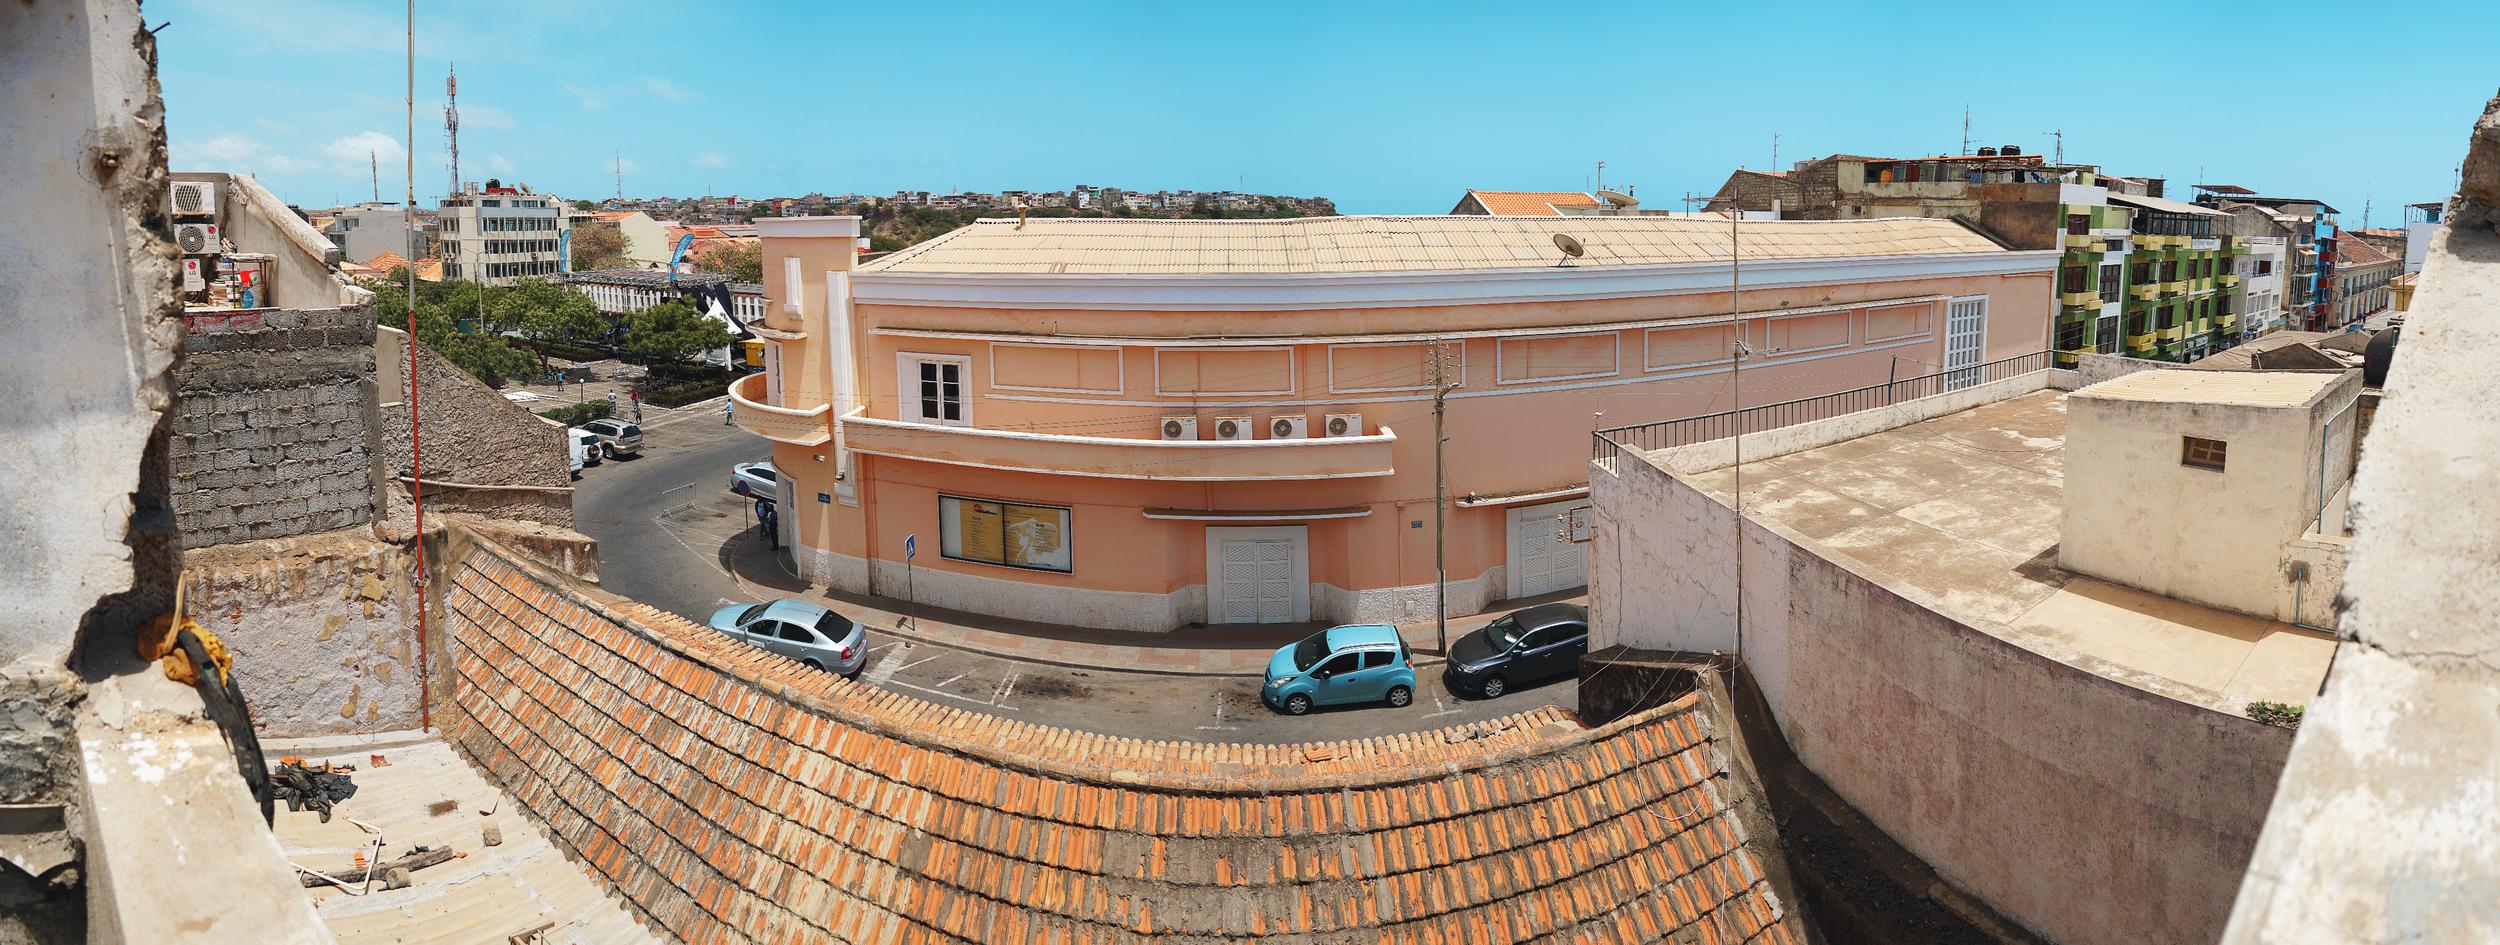 Praia_Maria_Panorama_Roof_05_20190412 (0;00;00;04)_Lres.png